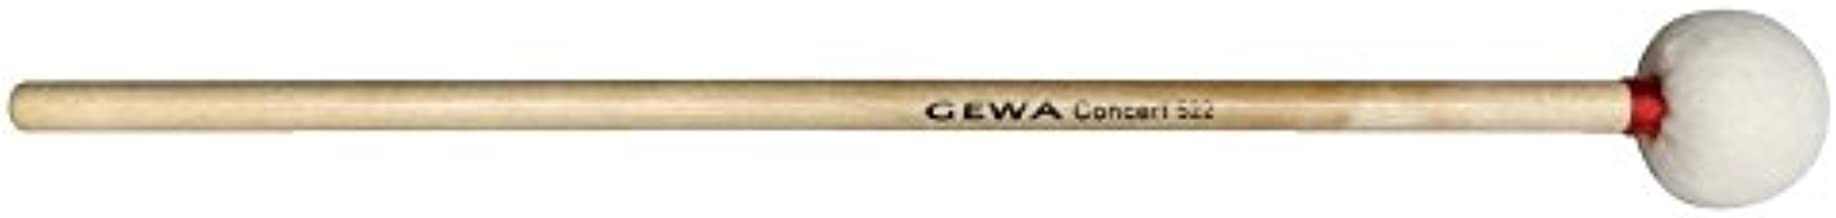 GEWA 821522.0 - Maza para timbal